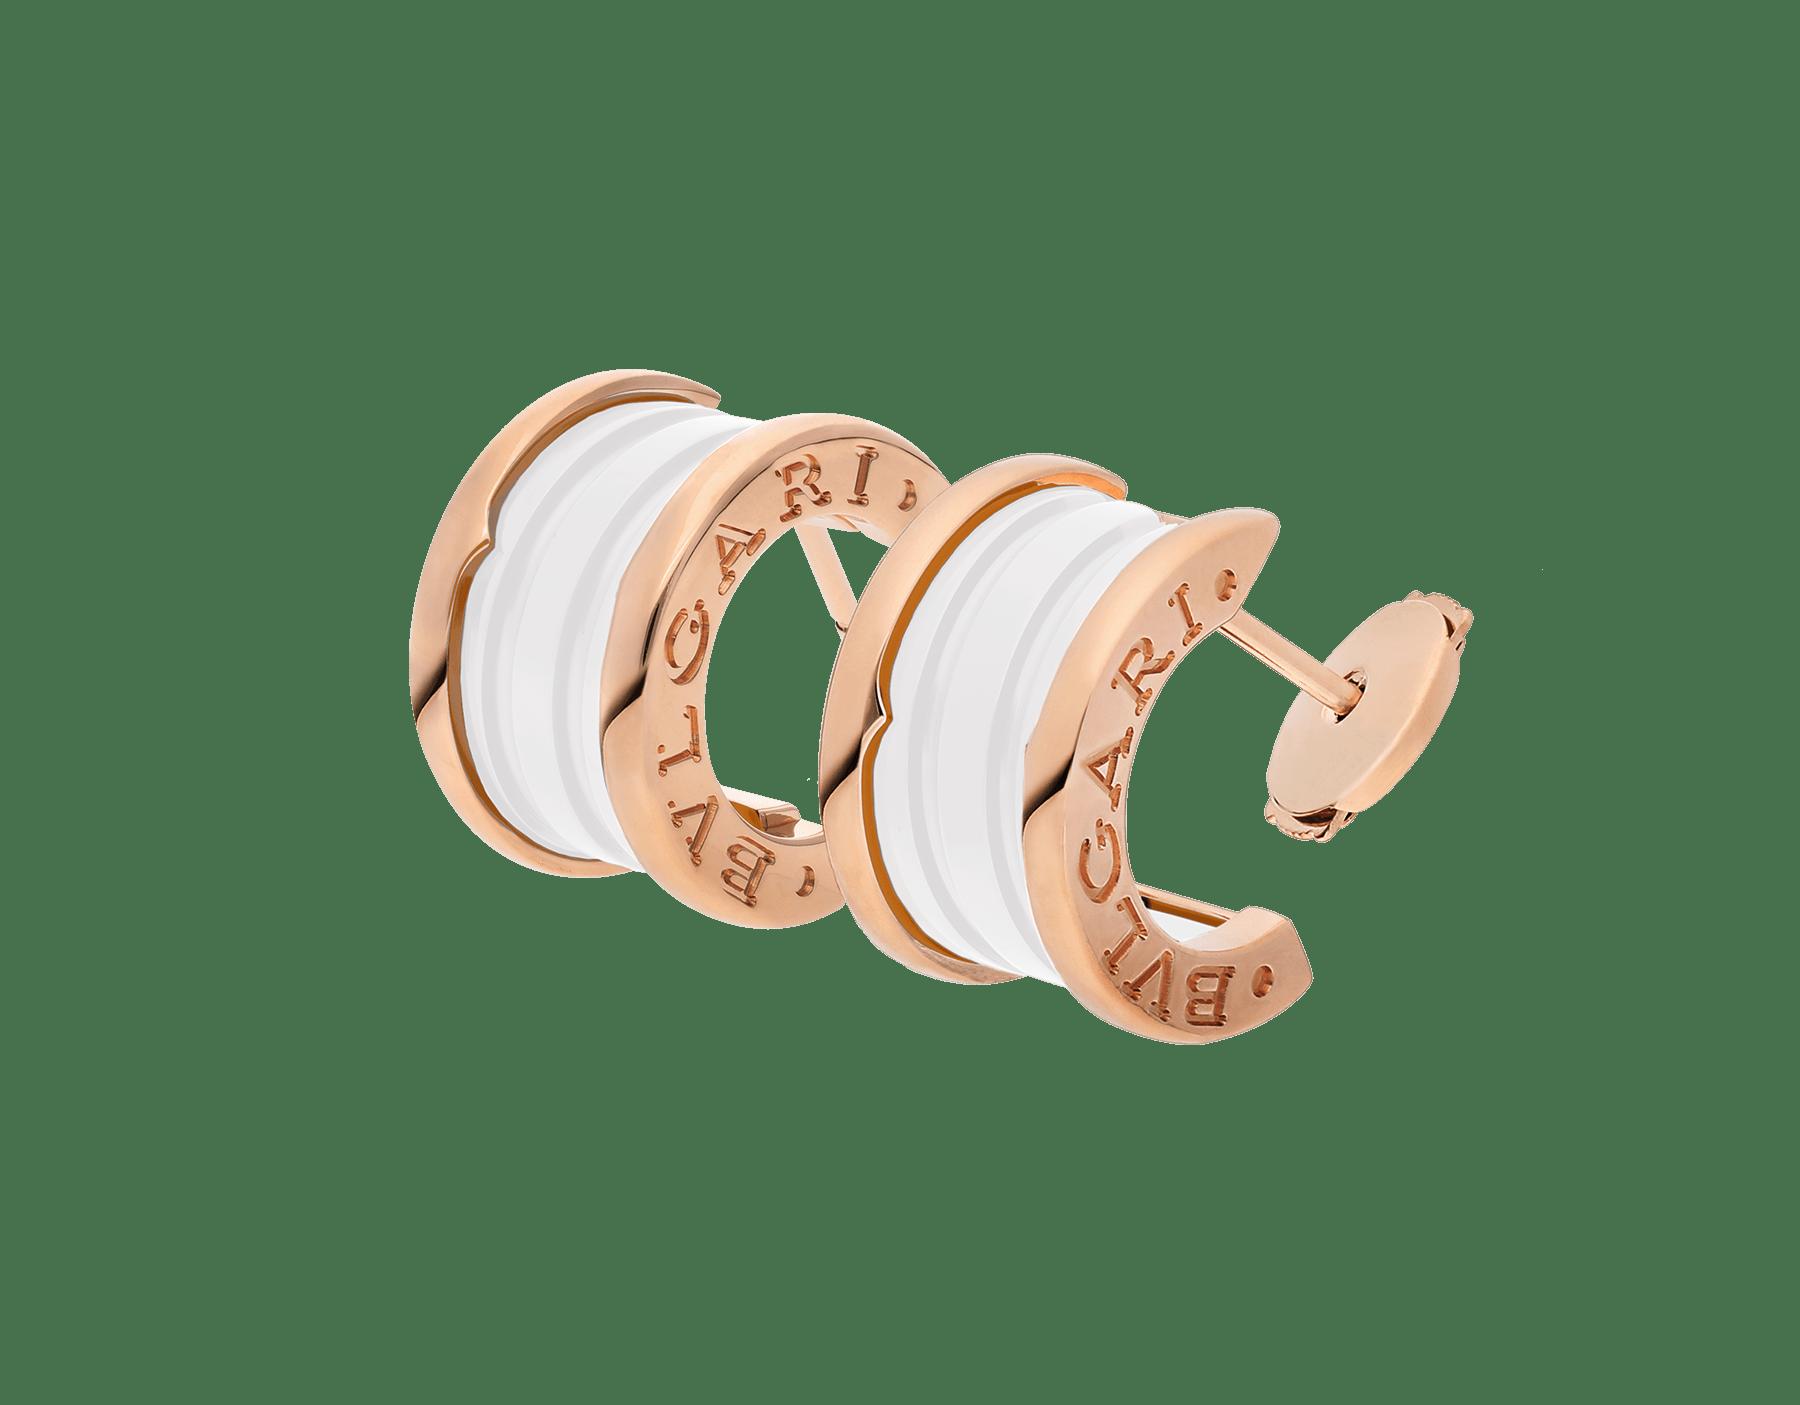 Серьги B.zero1, розовое золото 18 карат, белая керамика. 346464 image 2